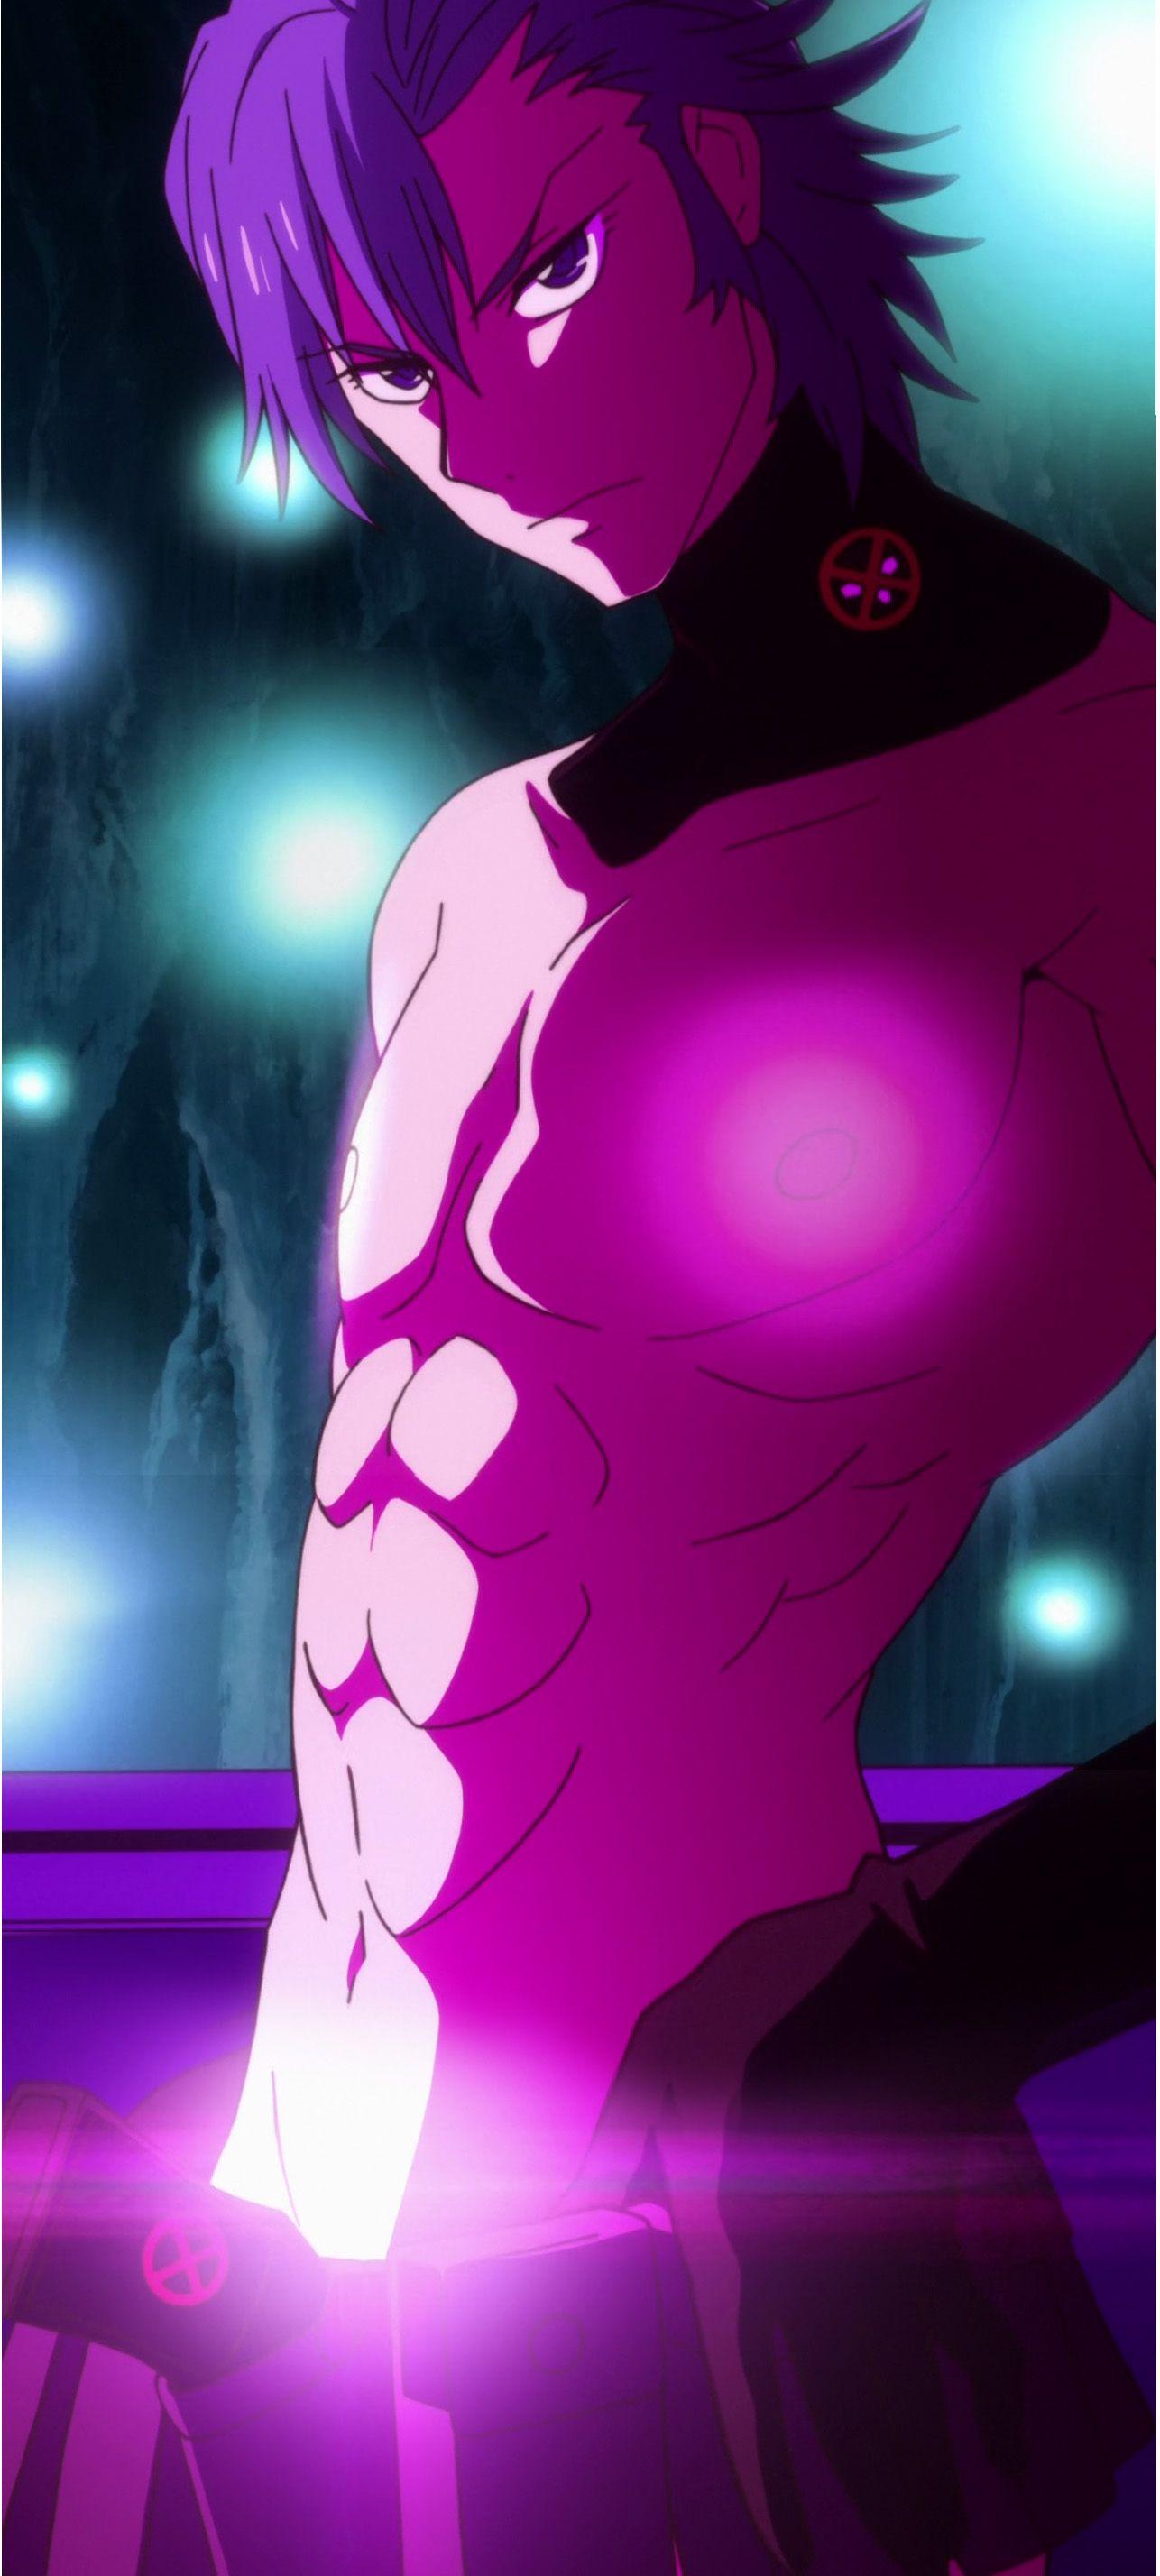 Aikuro Mikisugi aikuro mikisugi | anime guys, anime, art